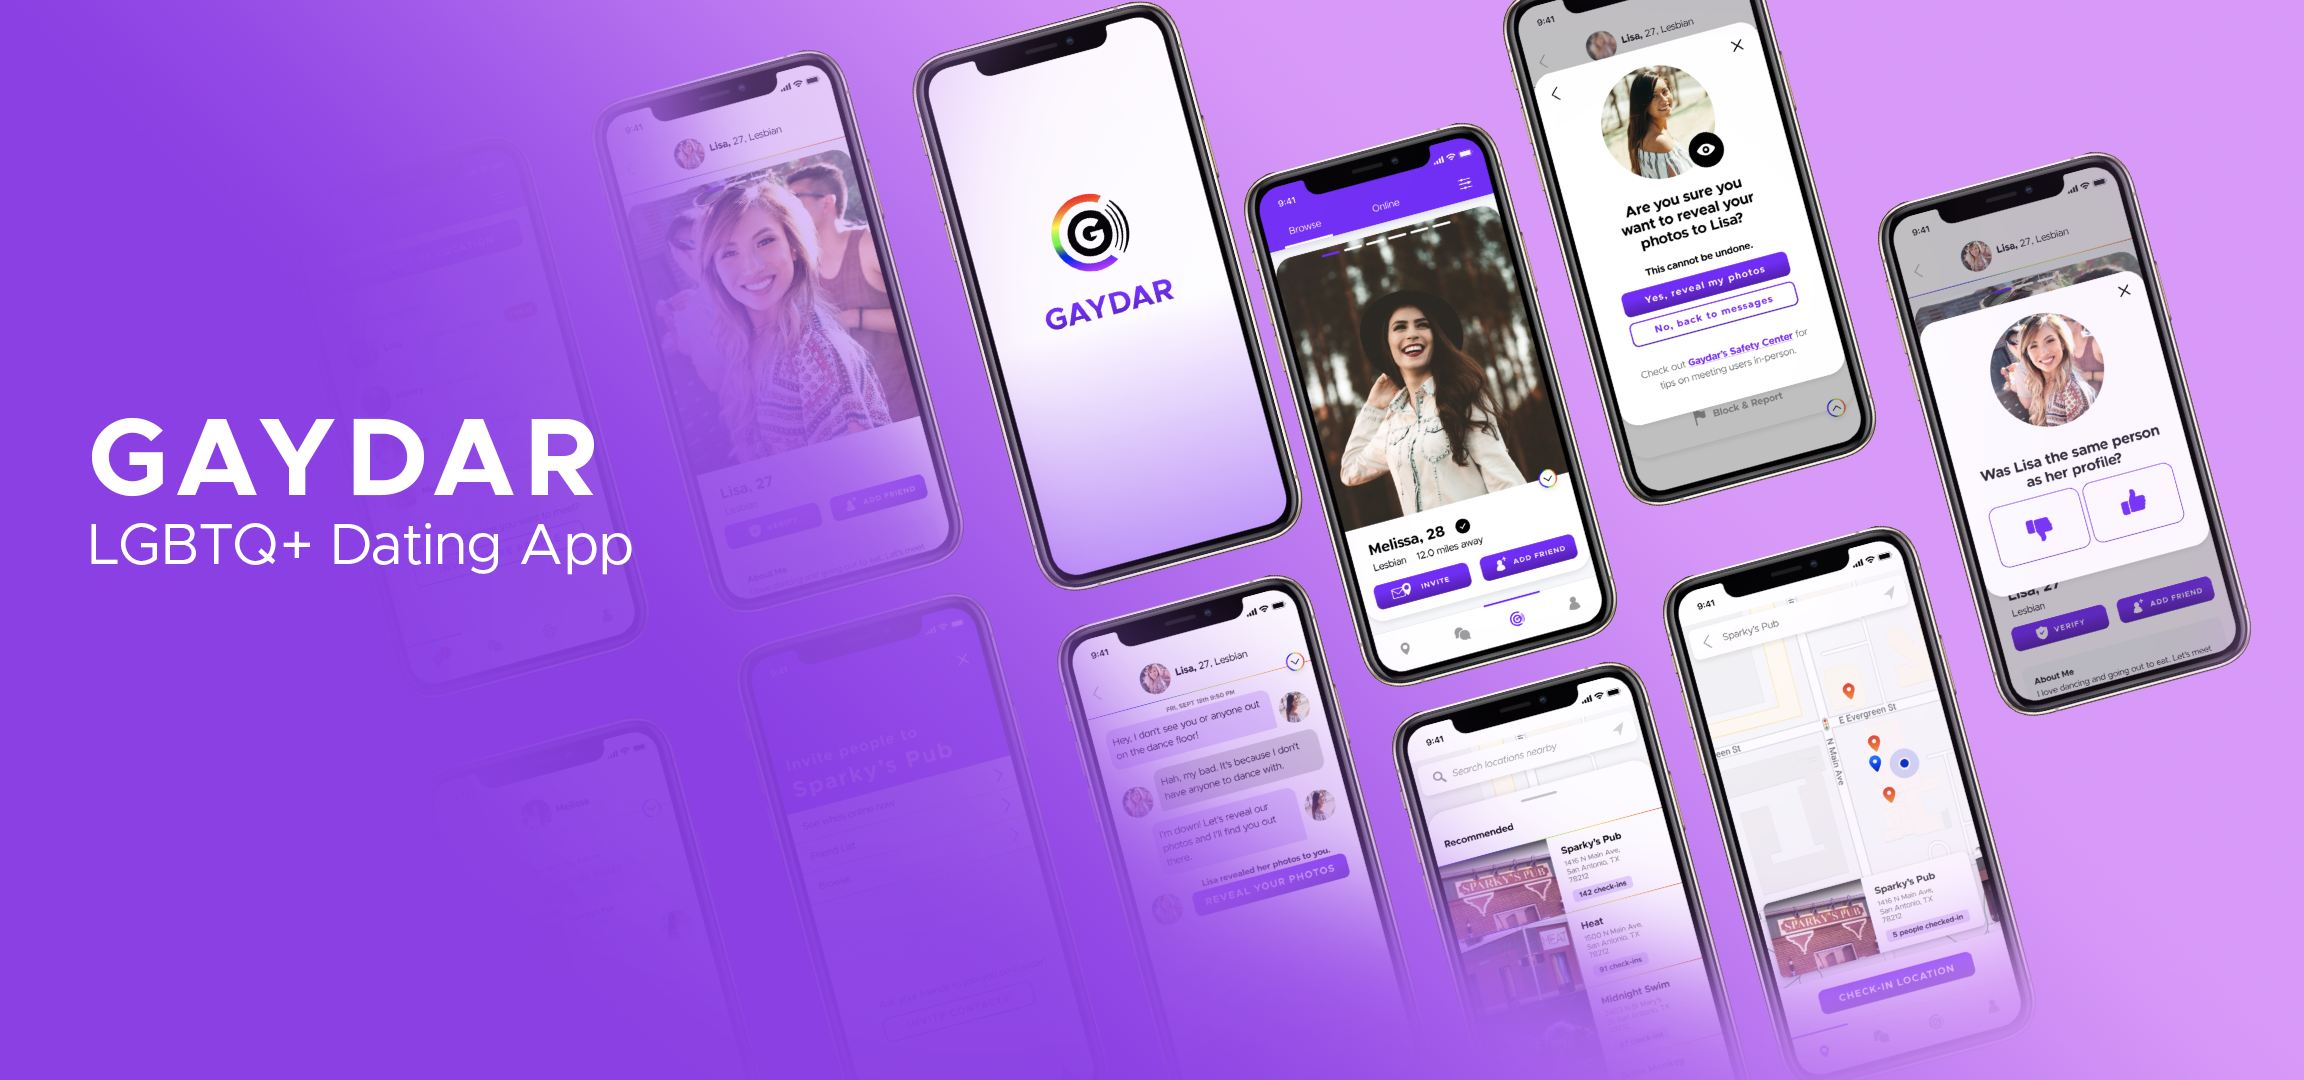 Gaydar-Cover-LGBT-App